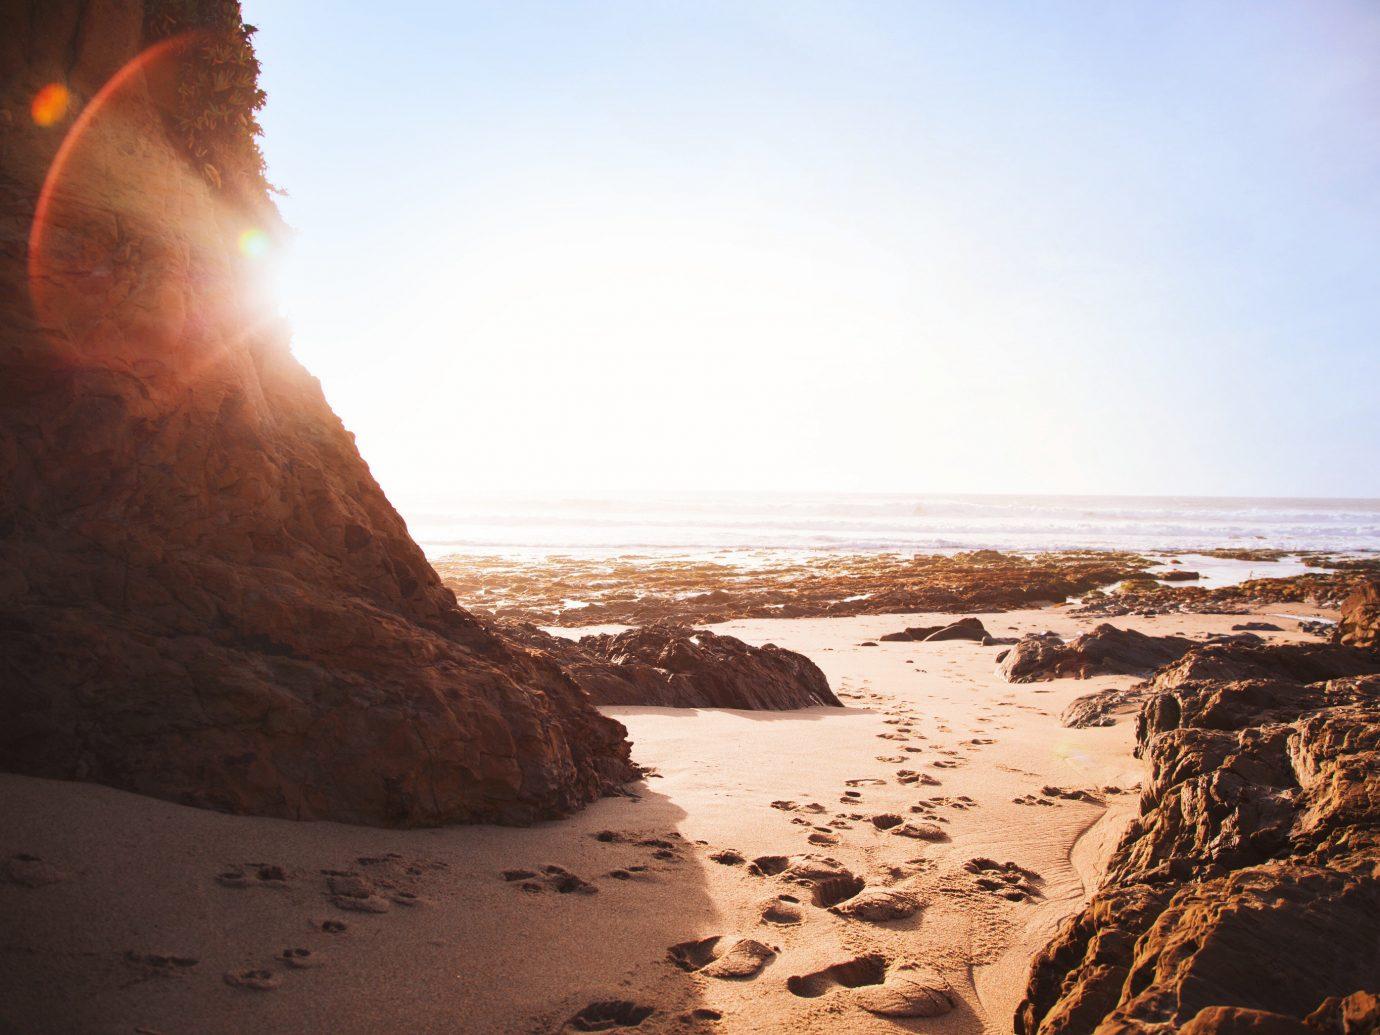 outdoor sky Nature Sea Coast body of water Ocean Beach shore rock wave morning sand wind wave sunlight Sunset cliff terrain material sunrise cape day